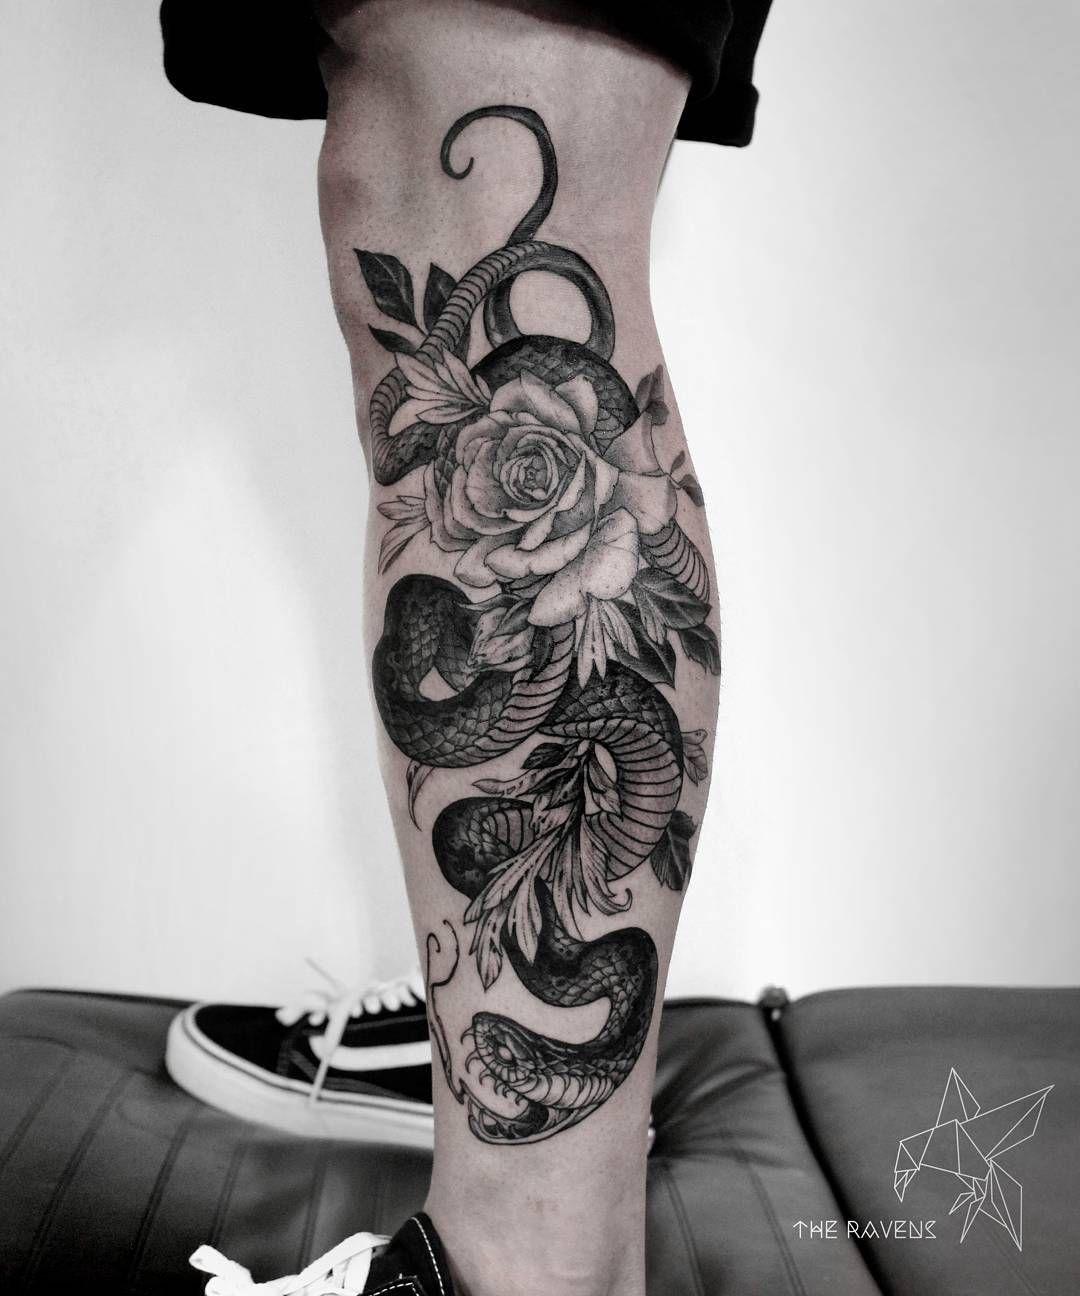 35 Amazing Rattlesnake Tattoo Designs Ideas // April, 2020